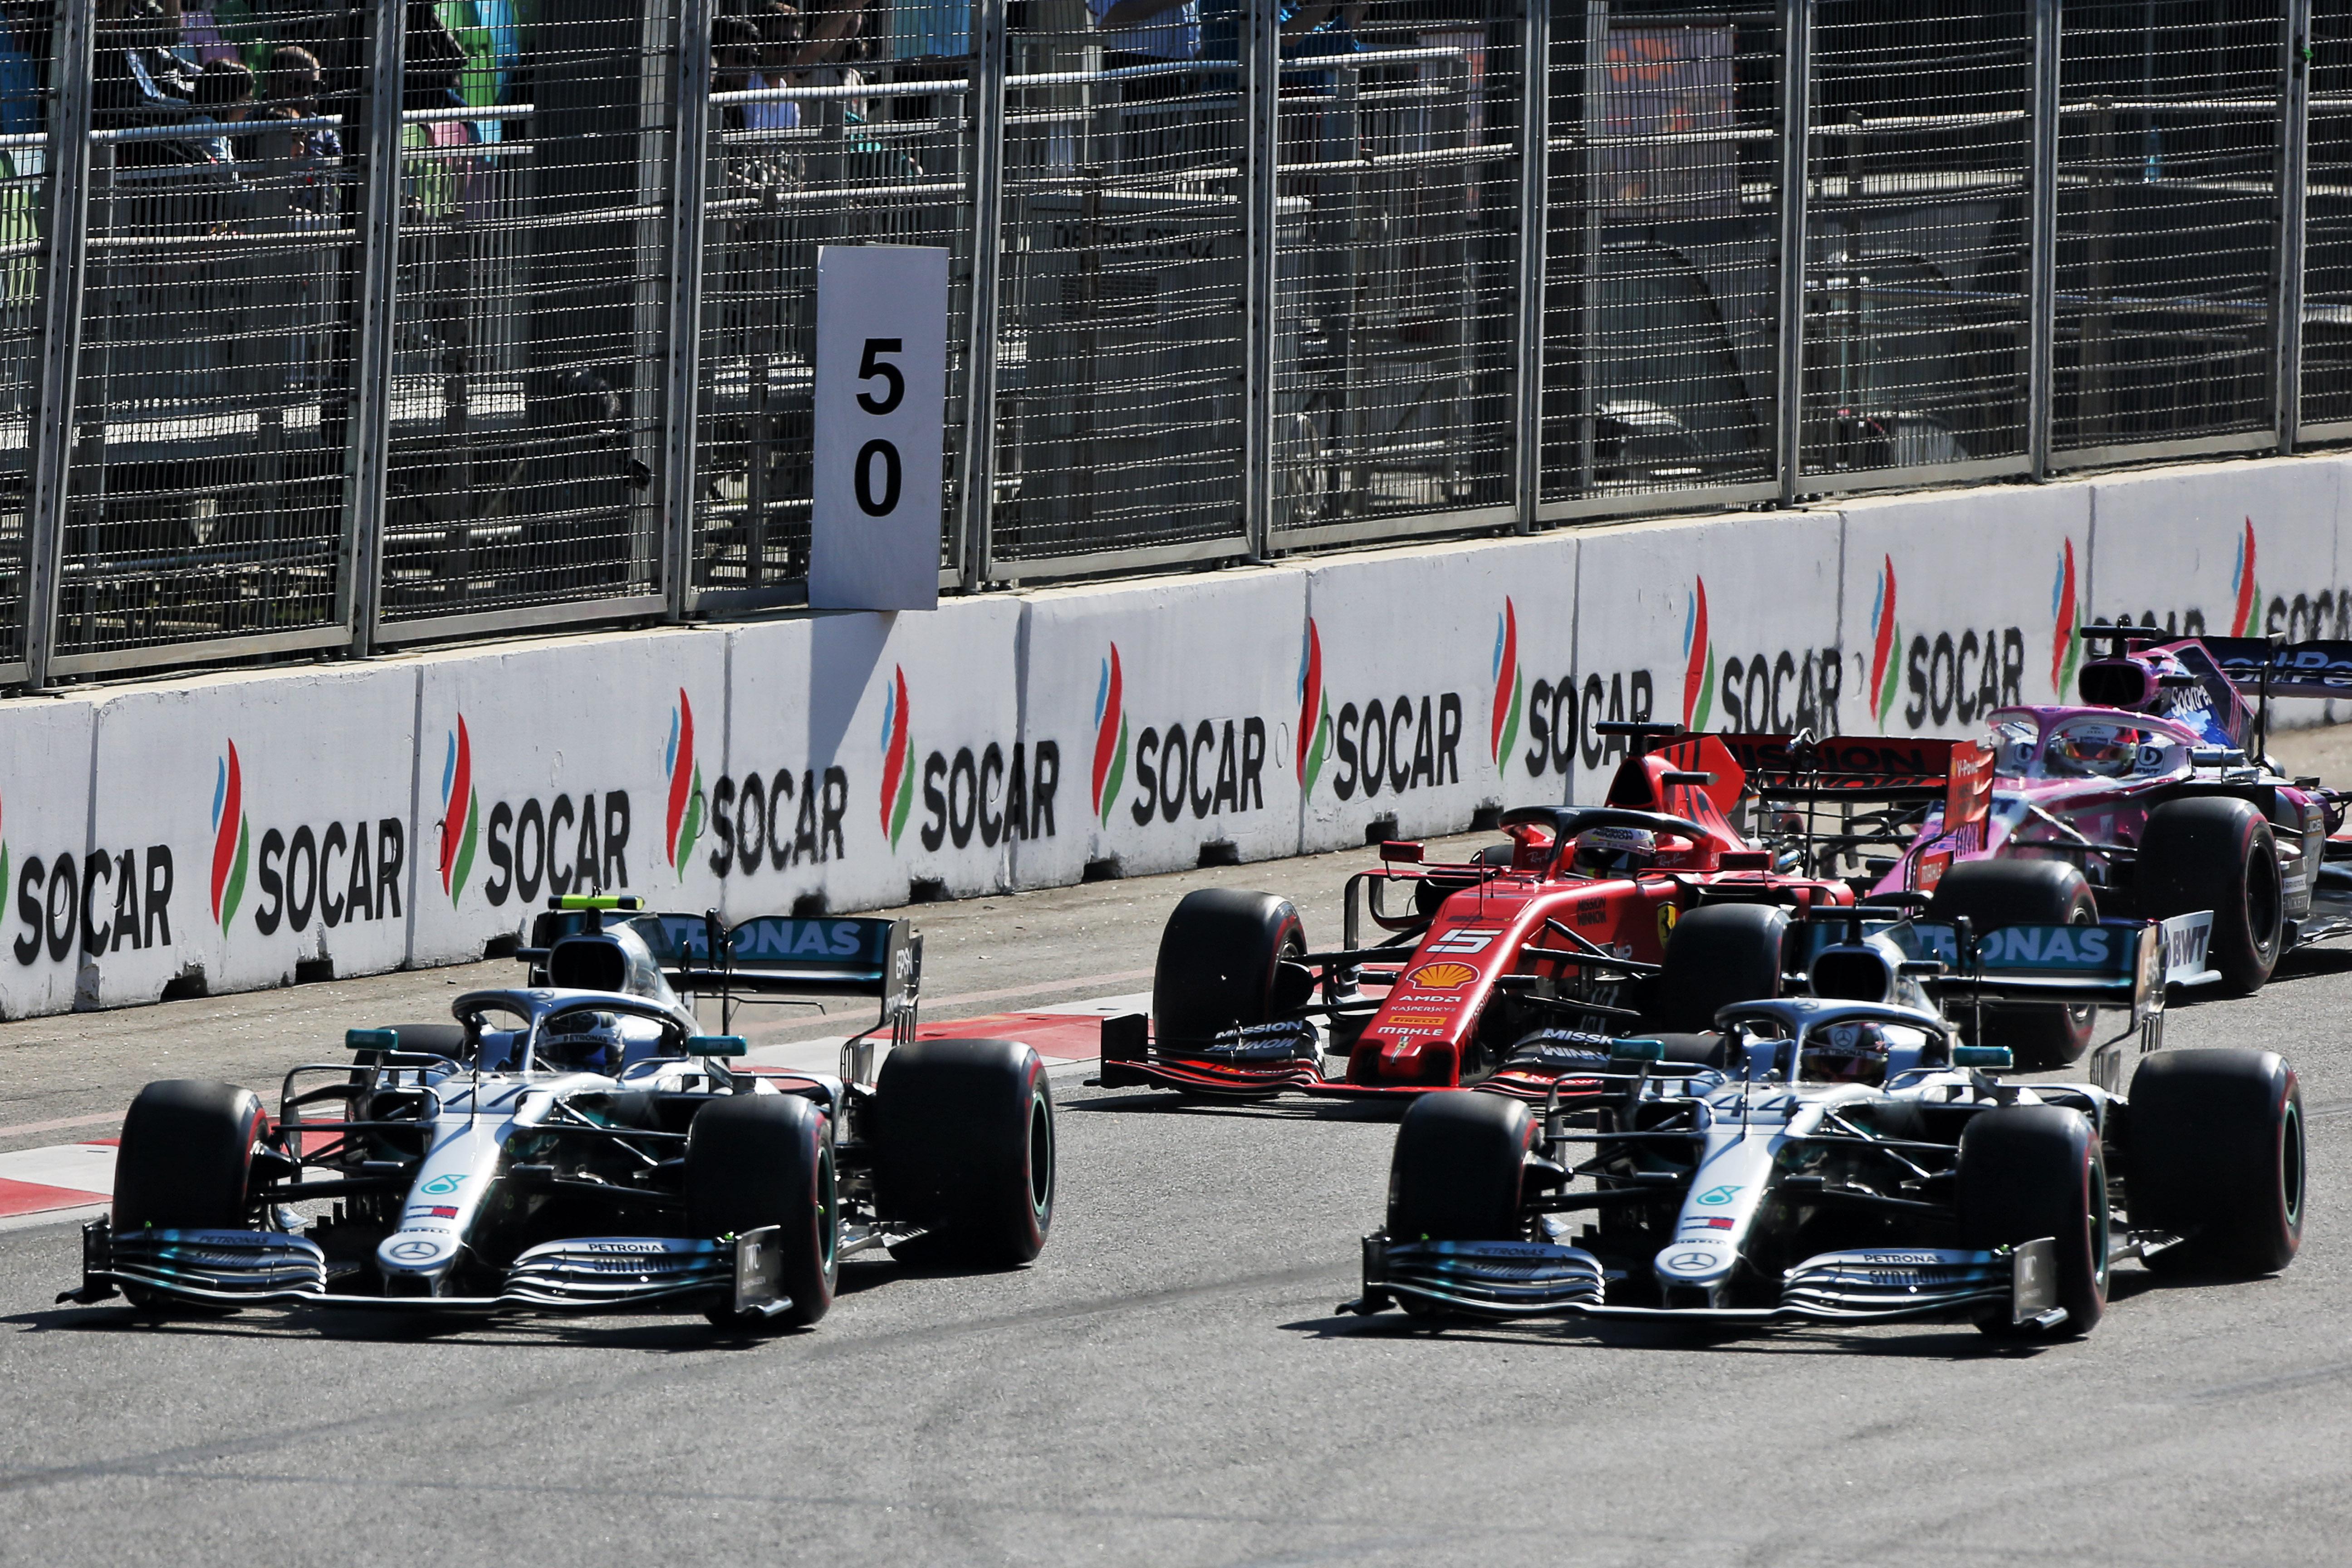 Lewis Hamilton Valtteri Bottas Mercedes Azerbaijan Grand Prix 2019